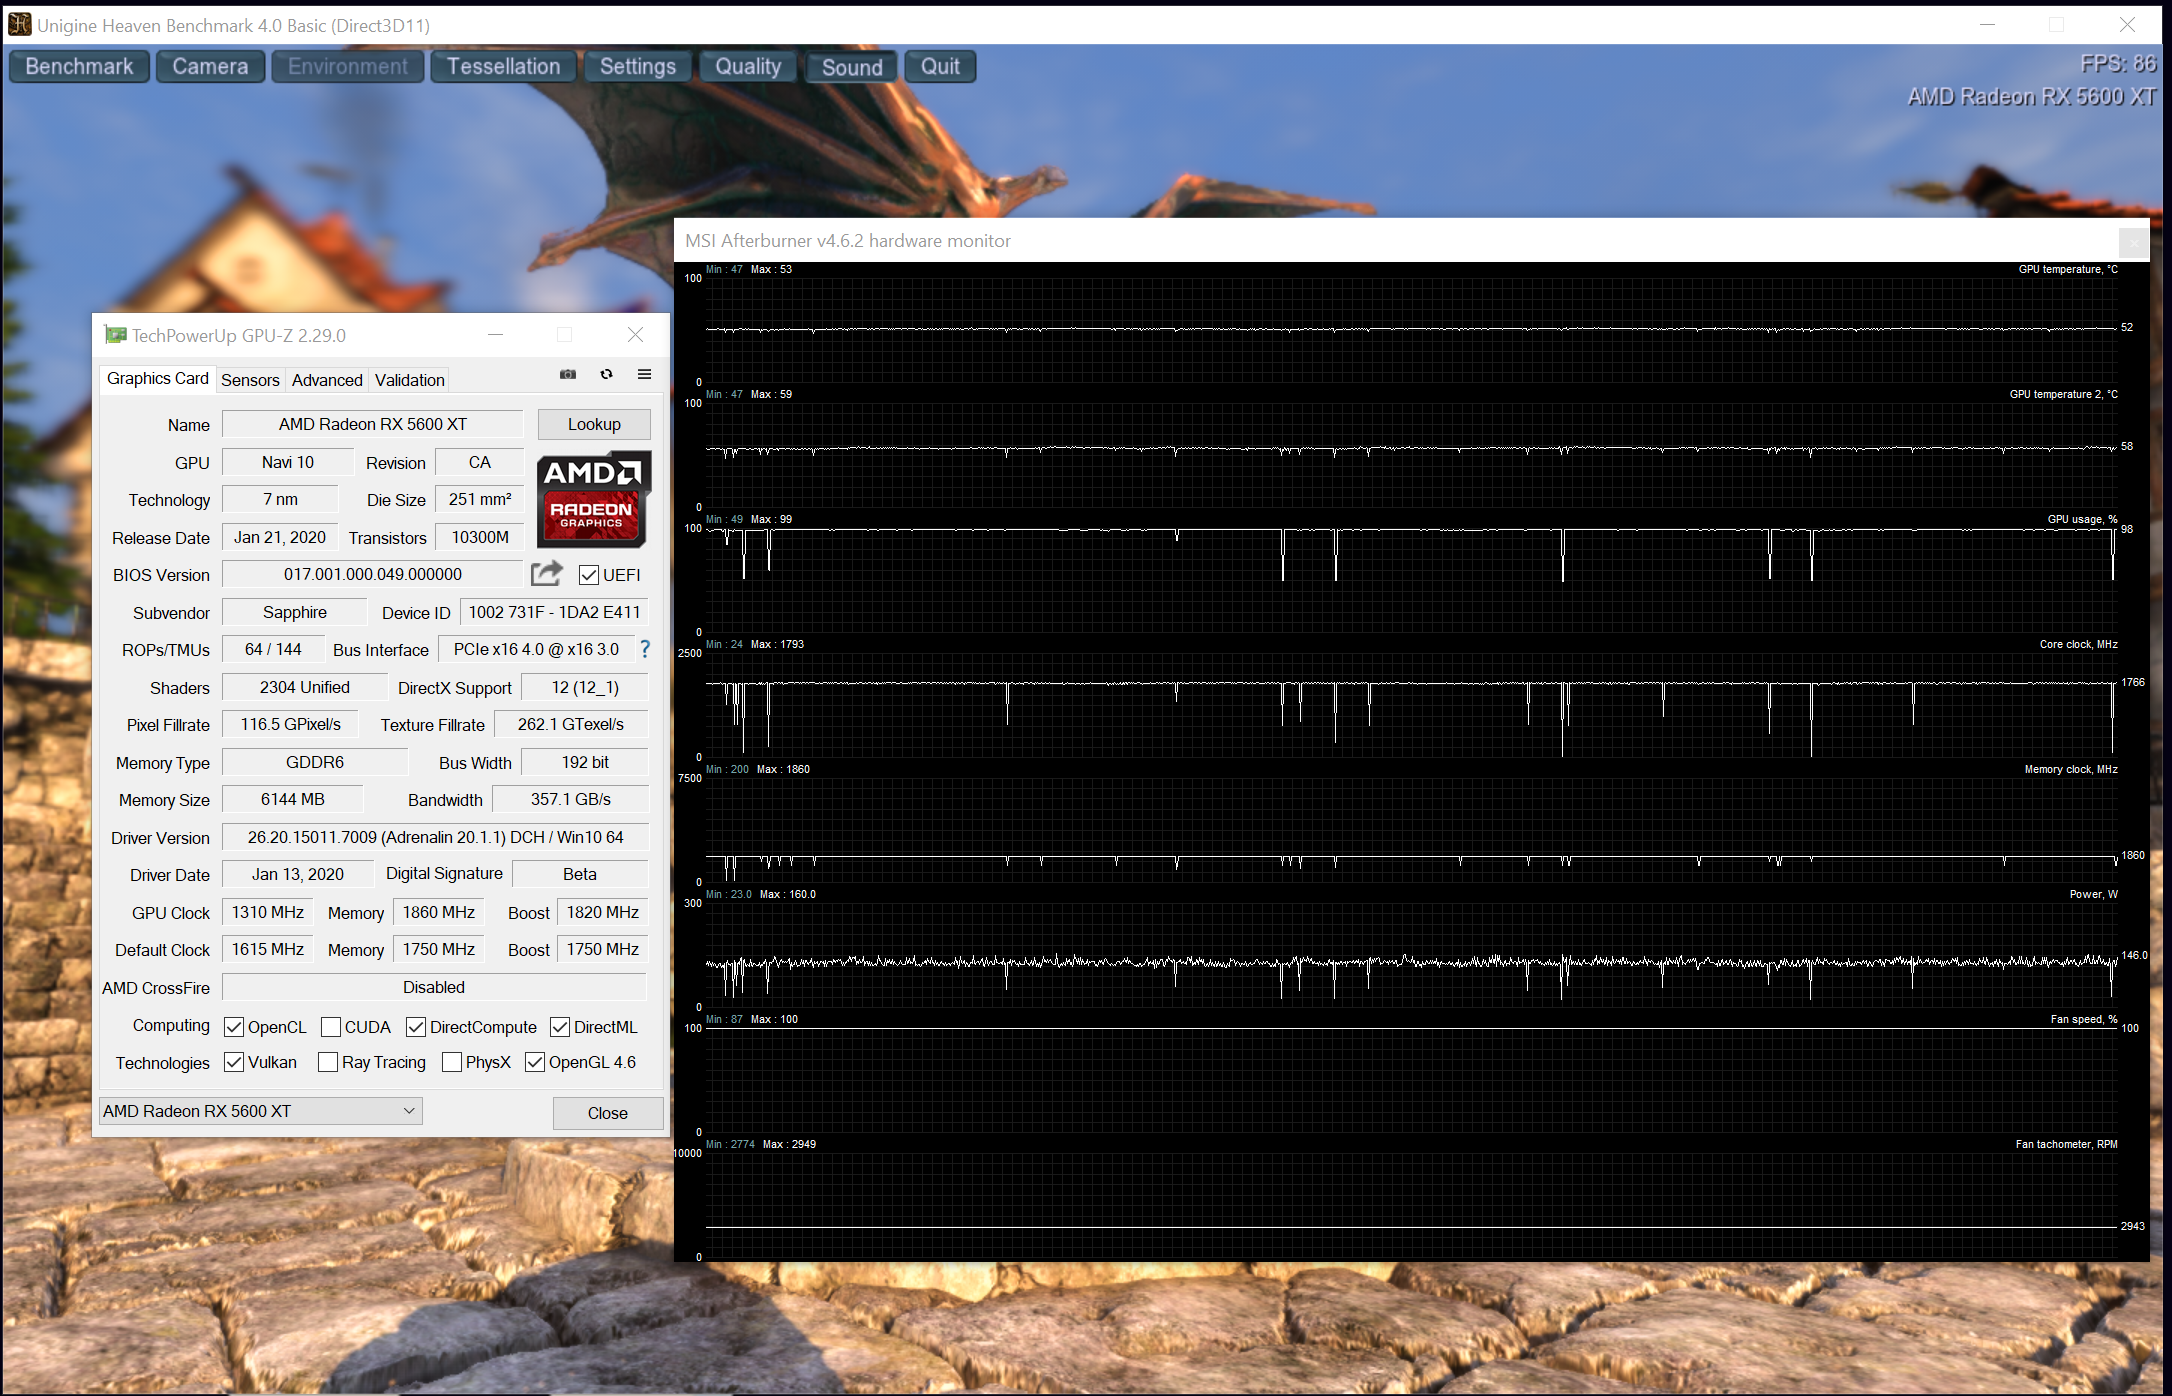 AMD Radeon RX 5600 XT review | WASD